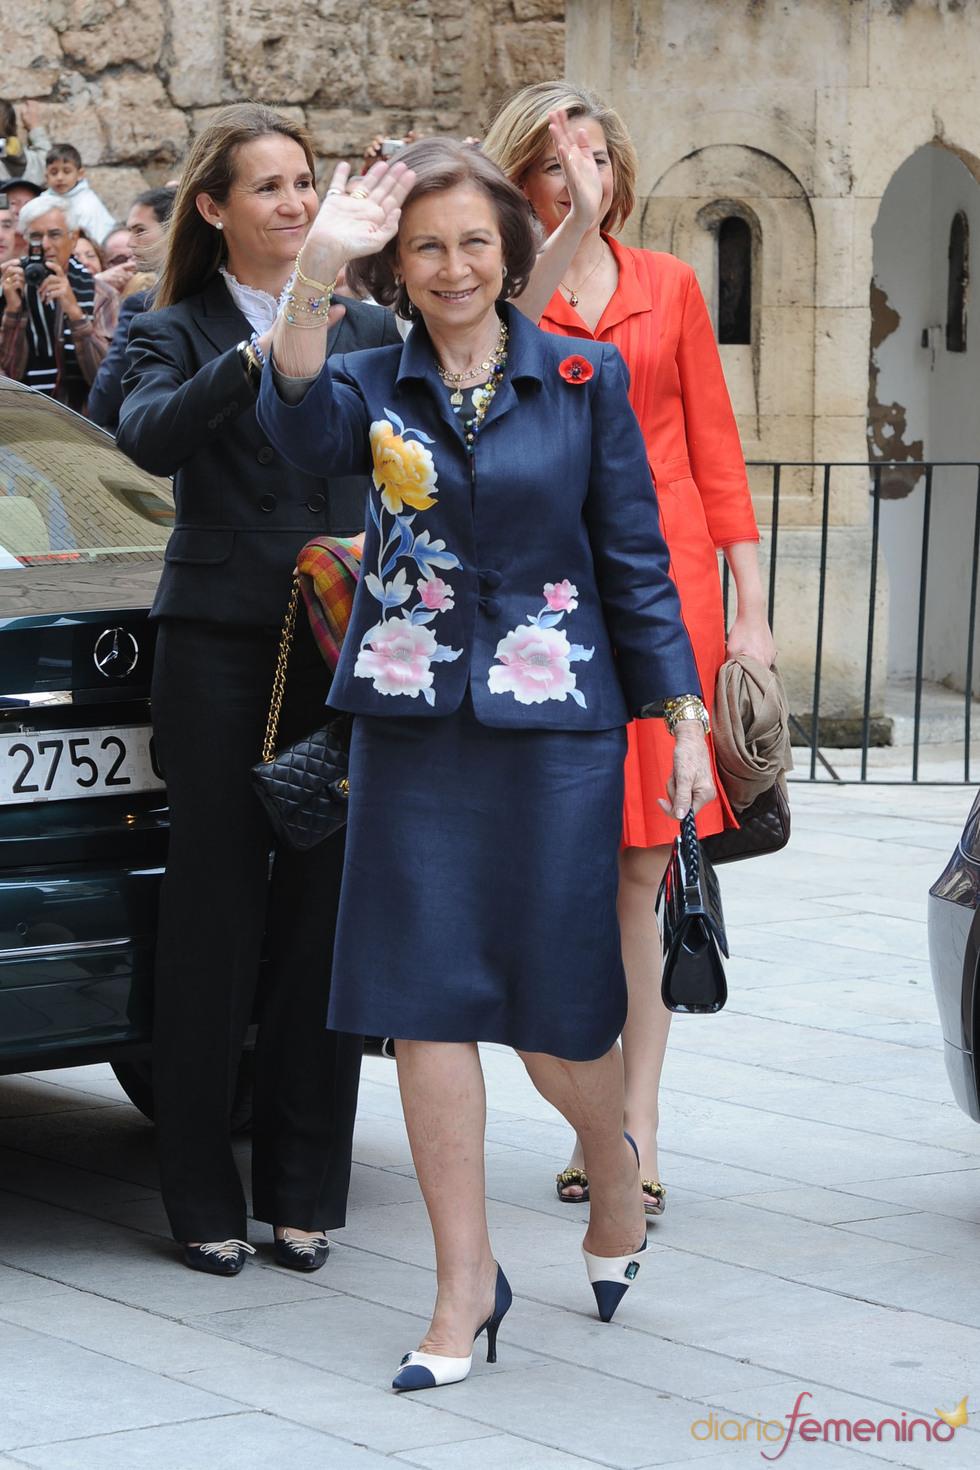 La reina Sofía de Grecia a su llegada a la Catedral de Mallorca por la Pascua